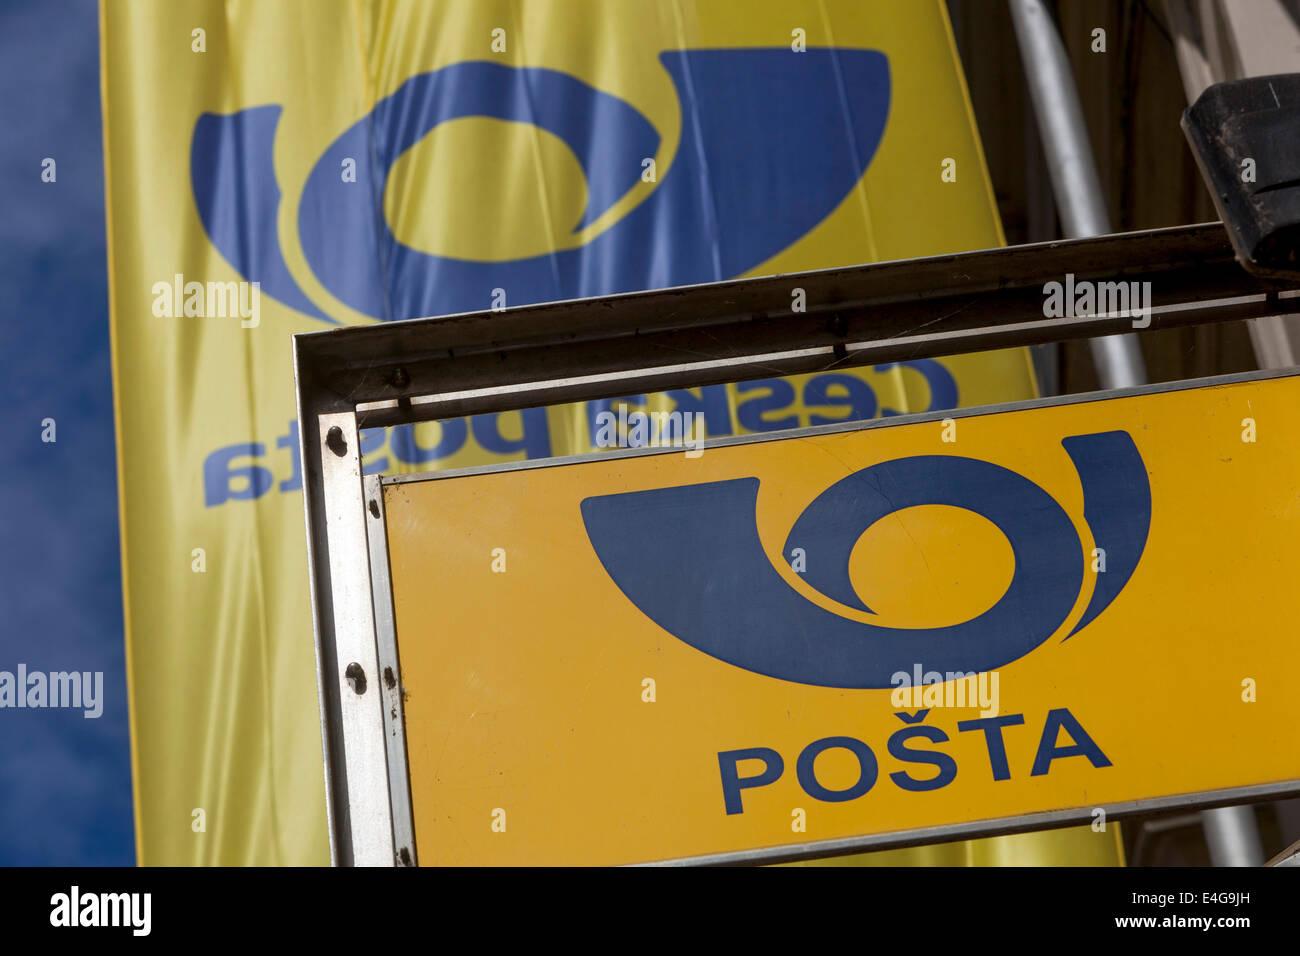 Ceska posta, Czech Post logo - Stock Image